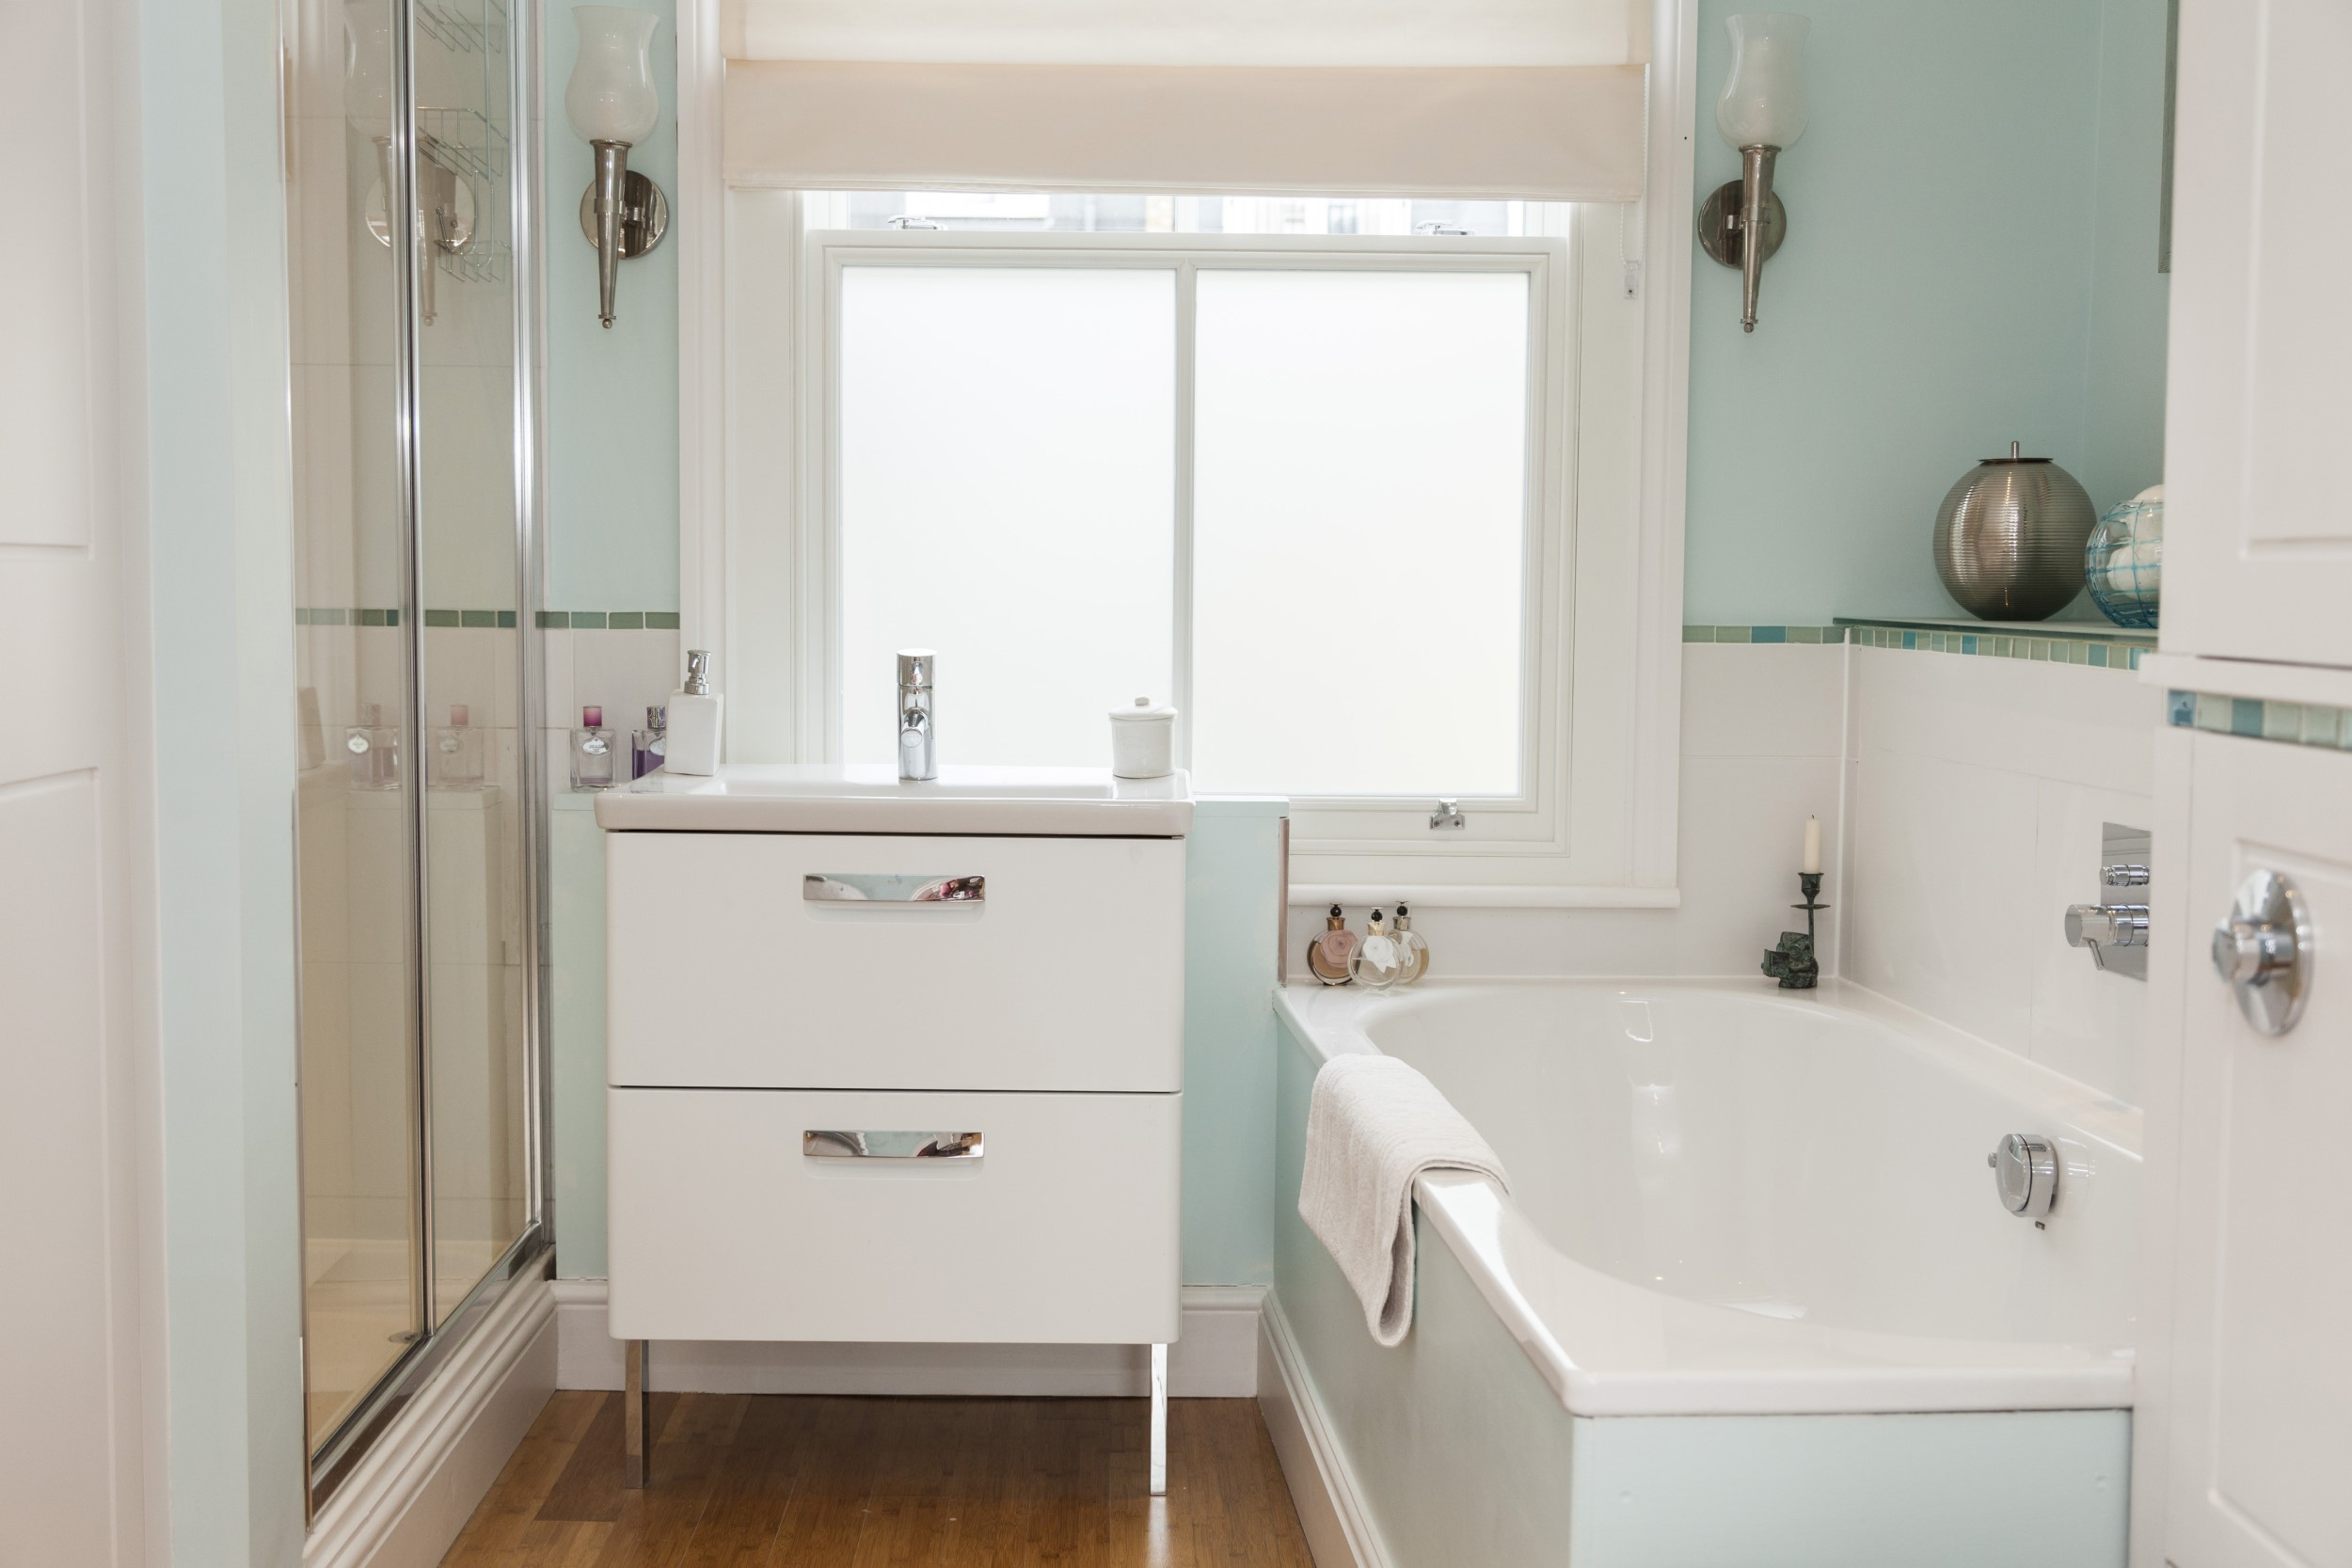 rjv-home-design-refurbishment-london-61141d37979a0